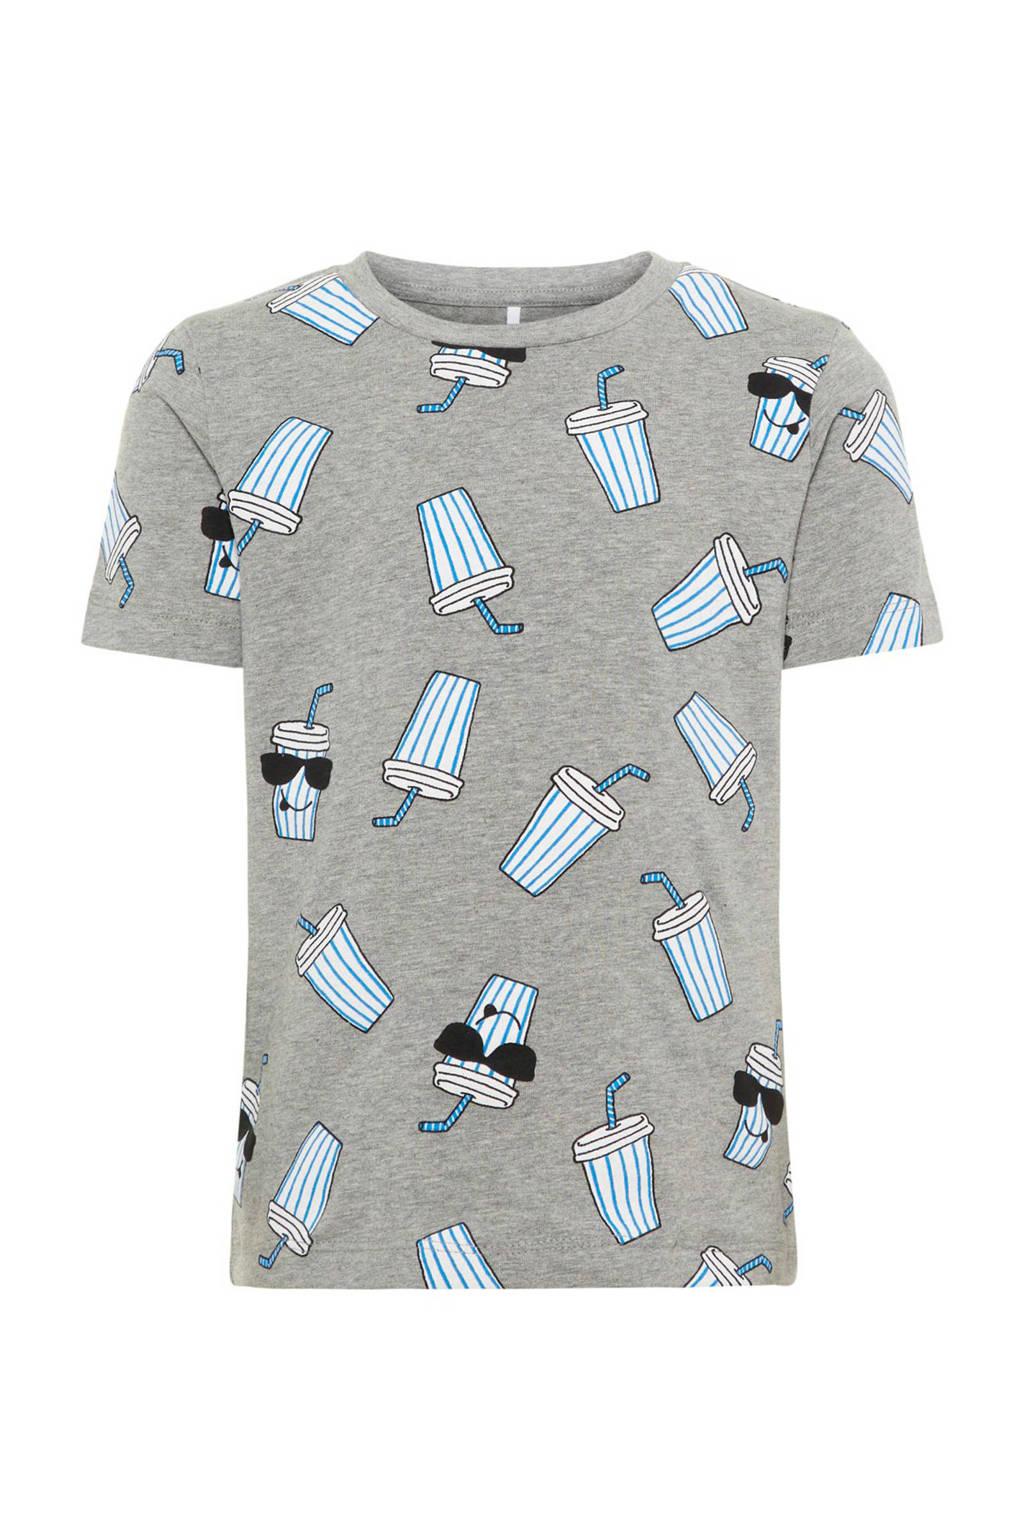 name it T-shirt Darasmus met all over print lichtgrijs melange, Grijs melange